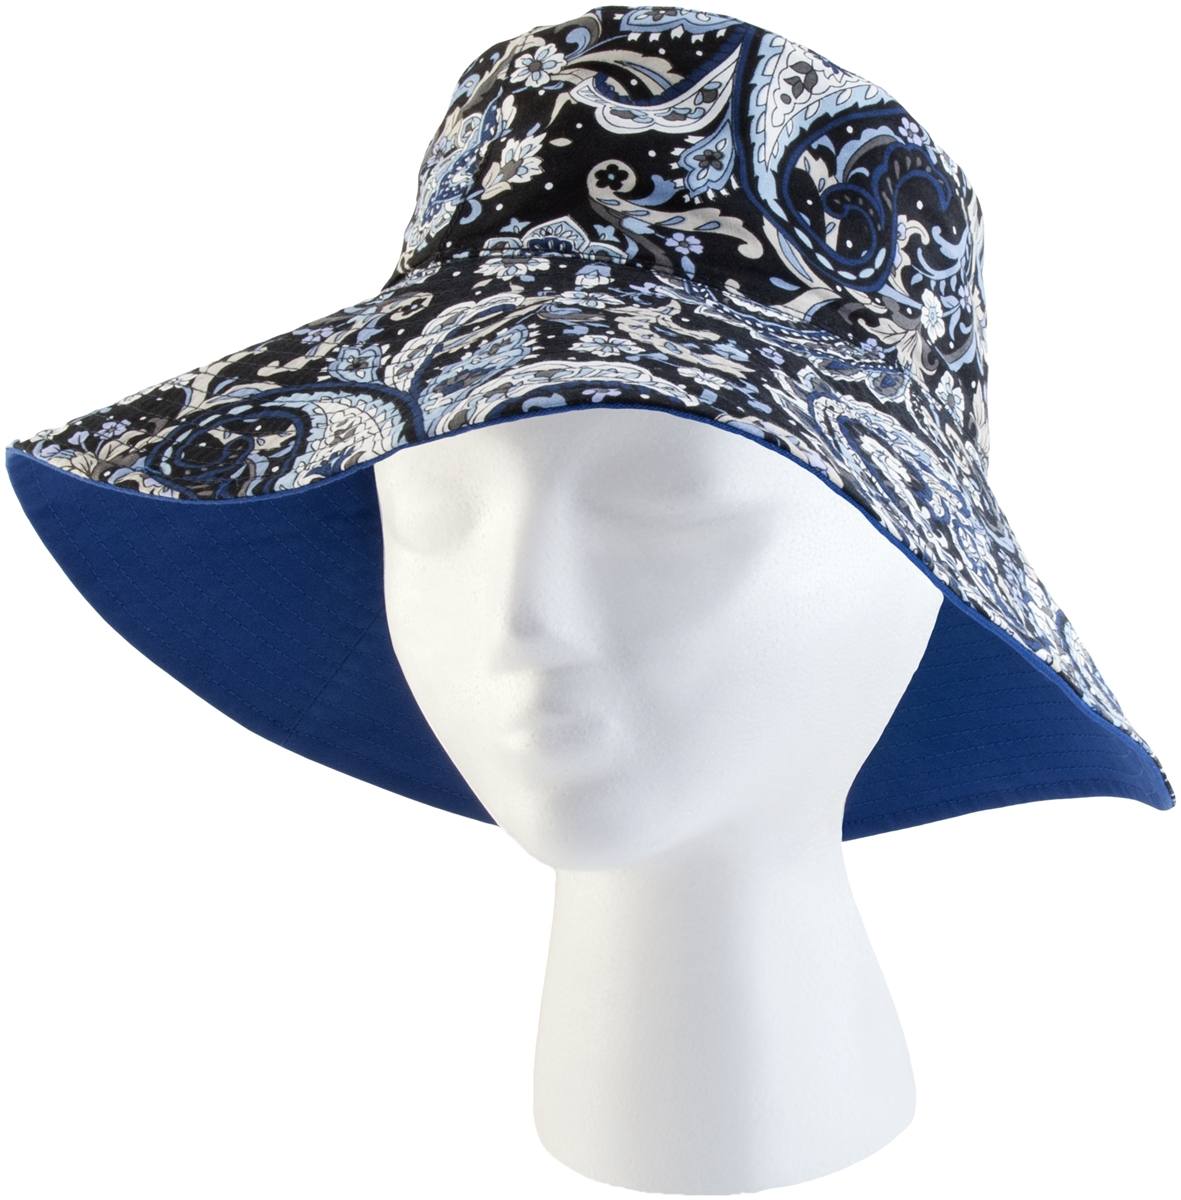 Women s Classic Cotton Bucket Hat - Blue Waves UPF 50+ 10cc3a34635